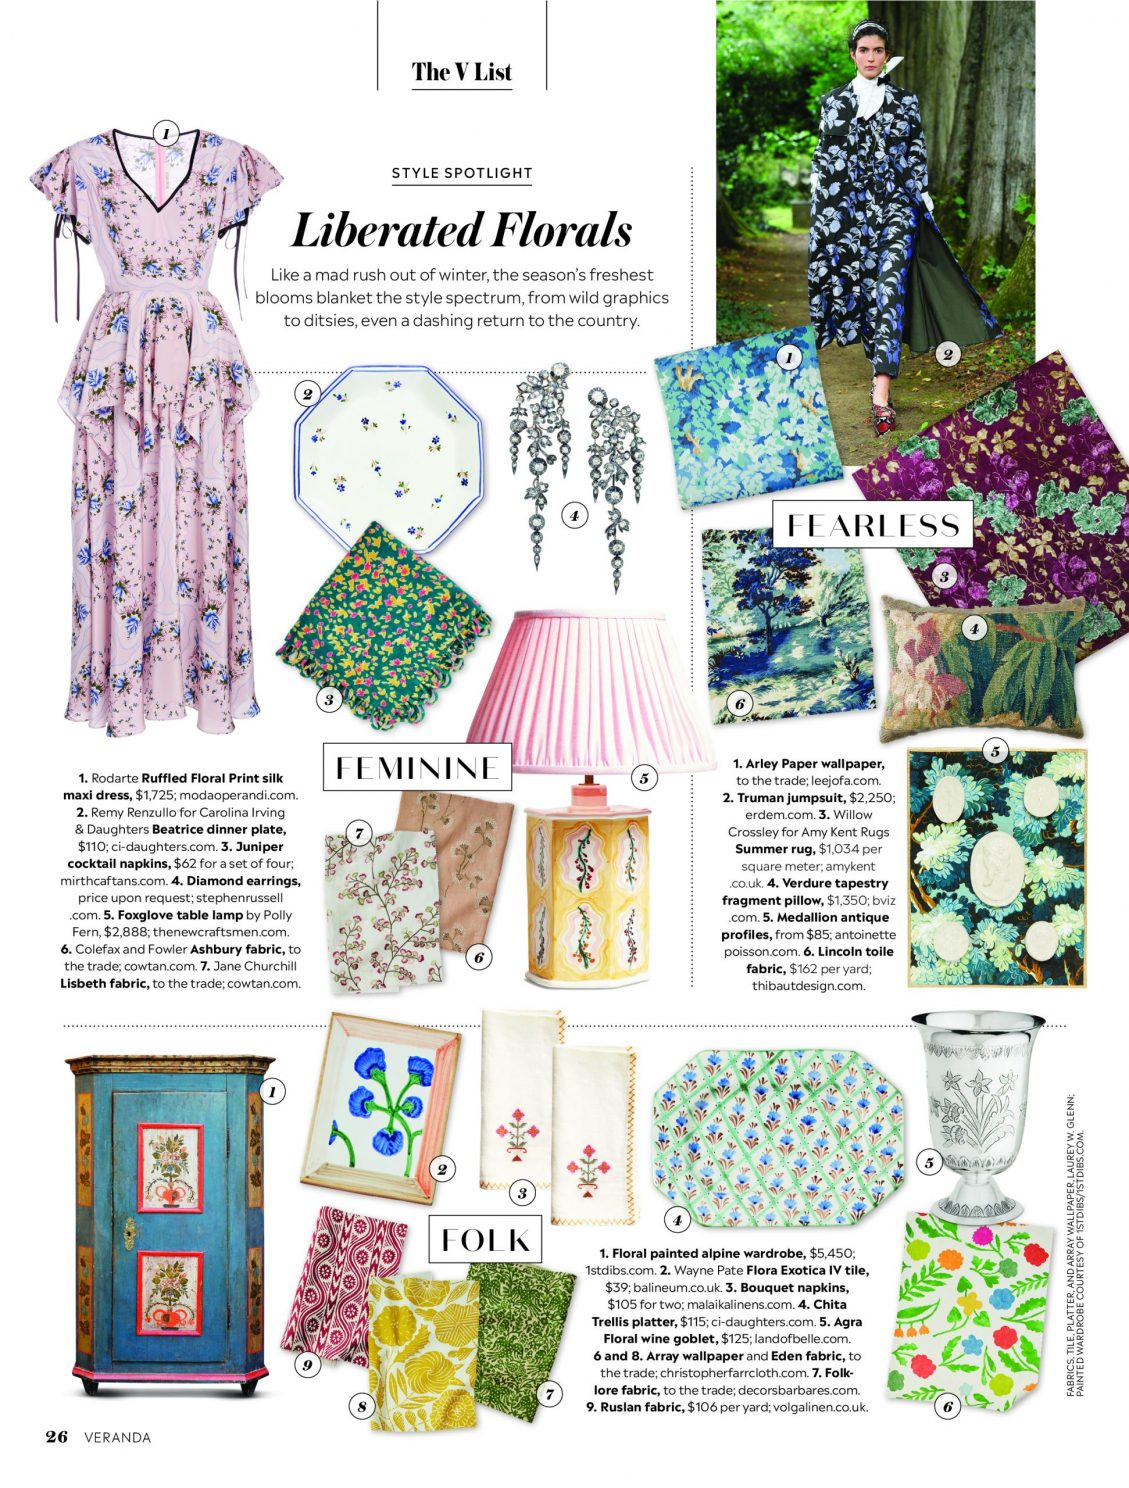 Veranda Magazine April 2021